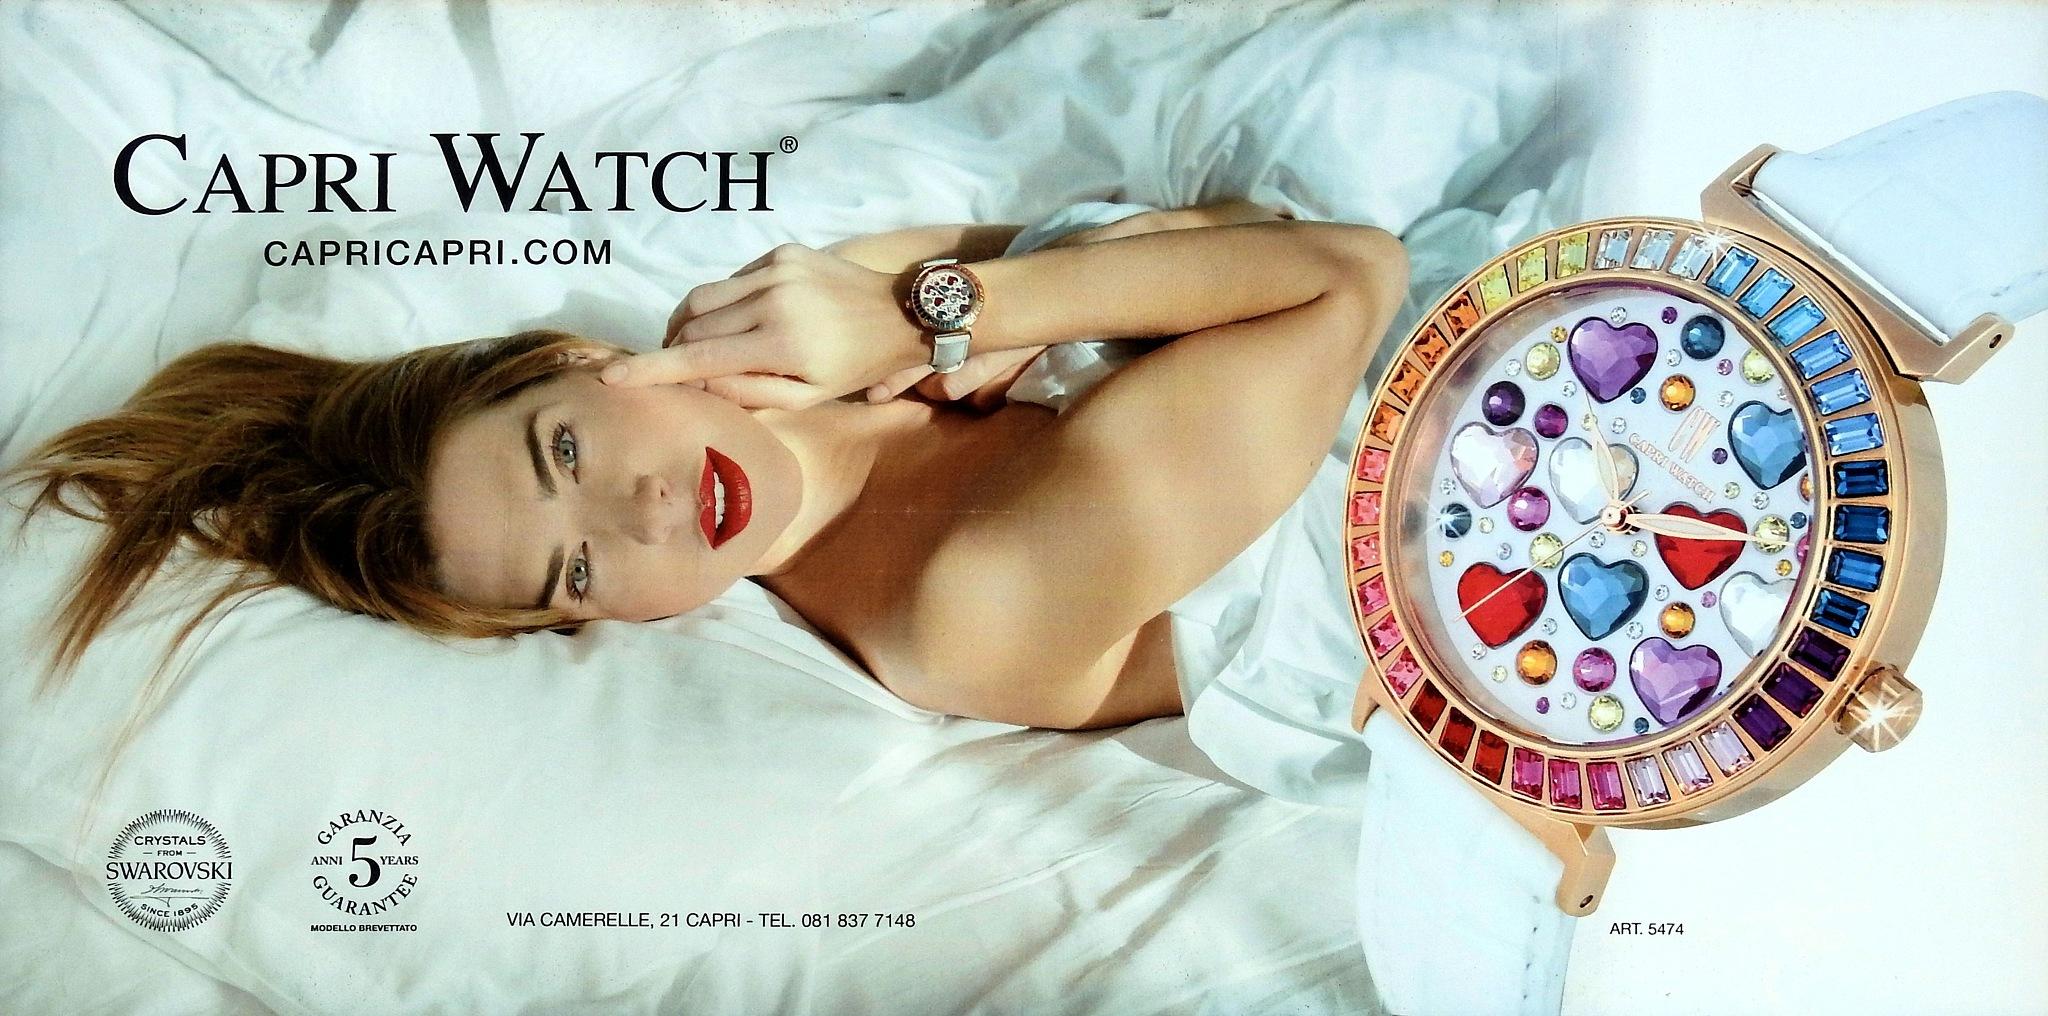 Naples - Capri Watch - Fashion & Watch by Arnaldo De Lisio